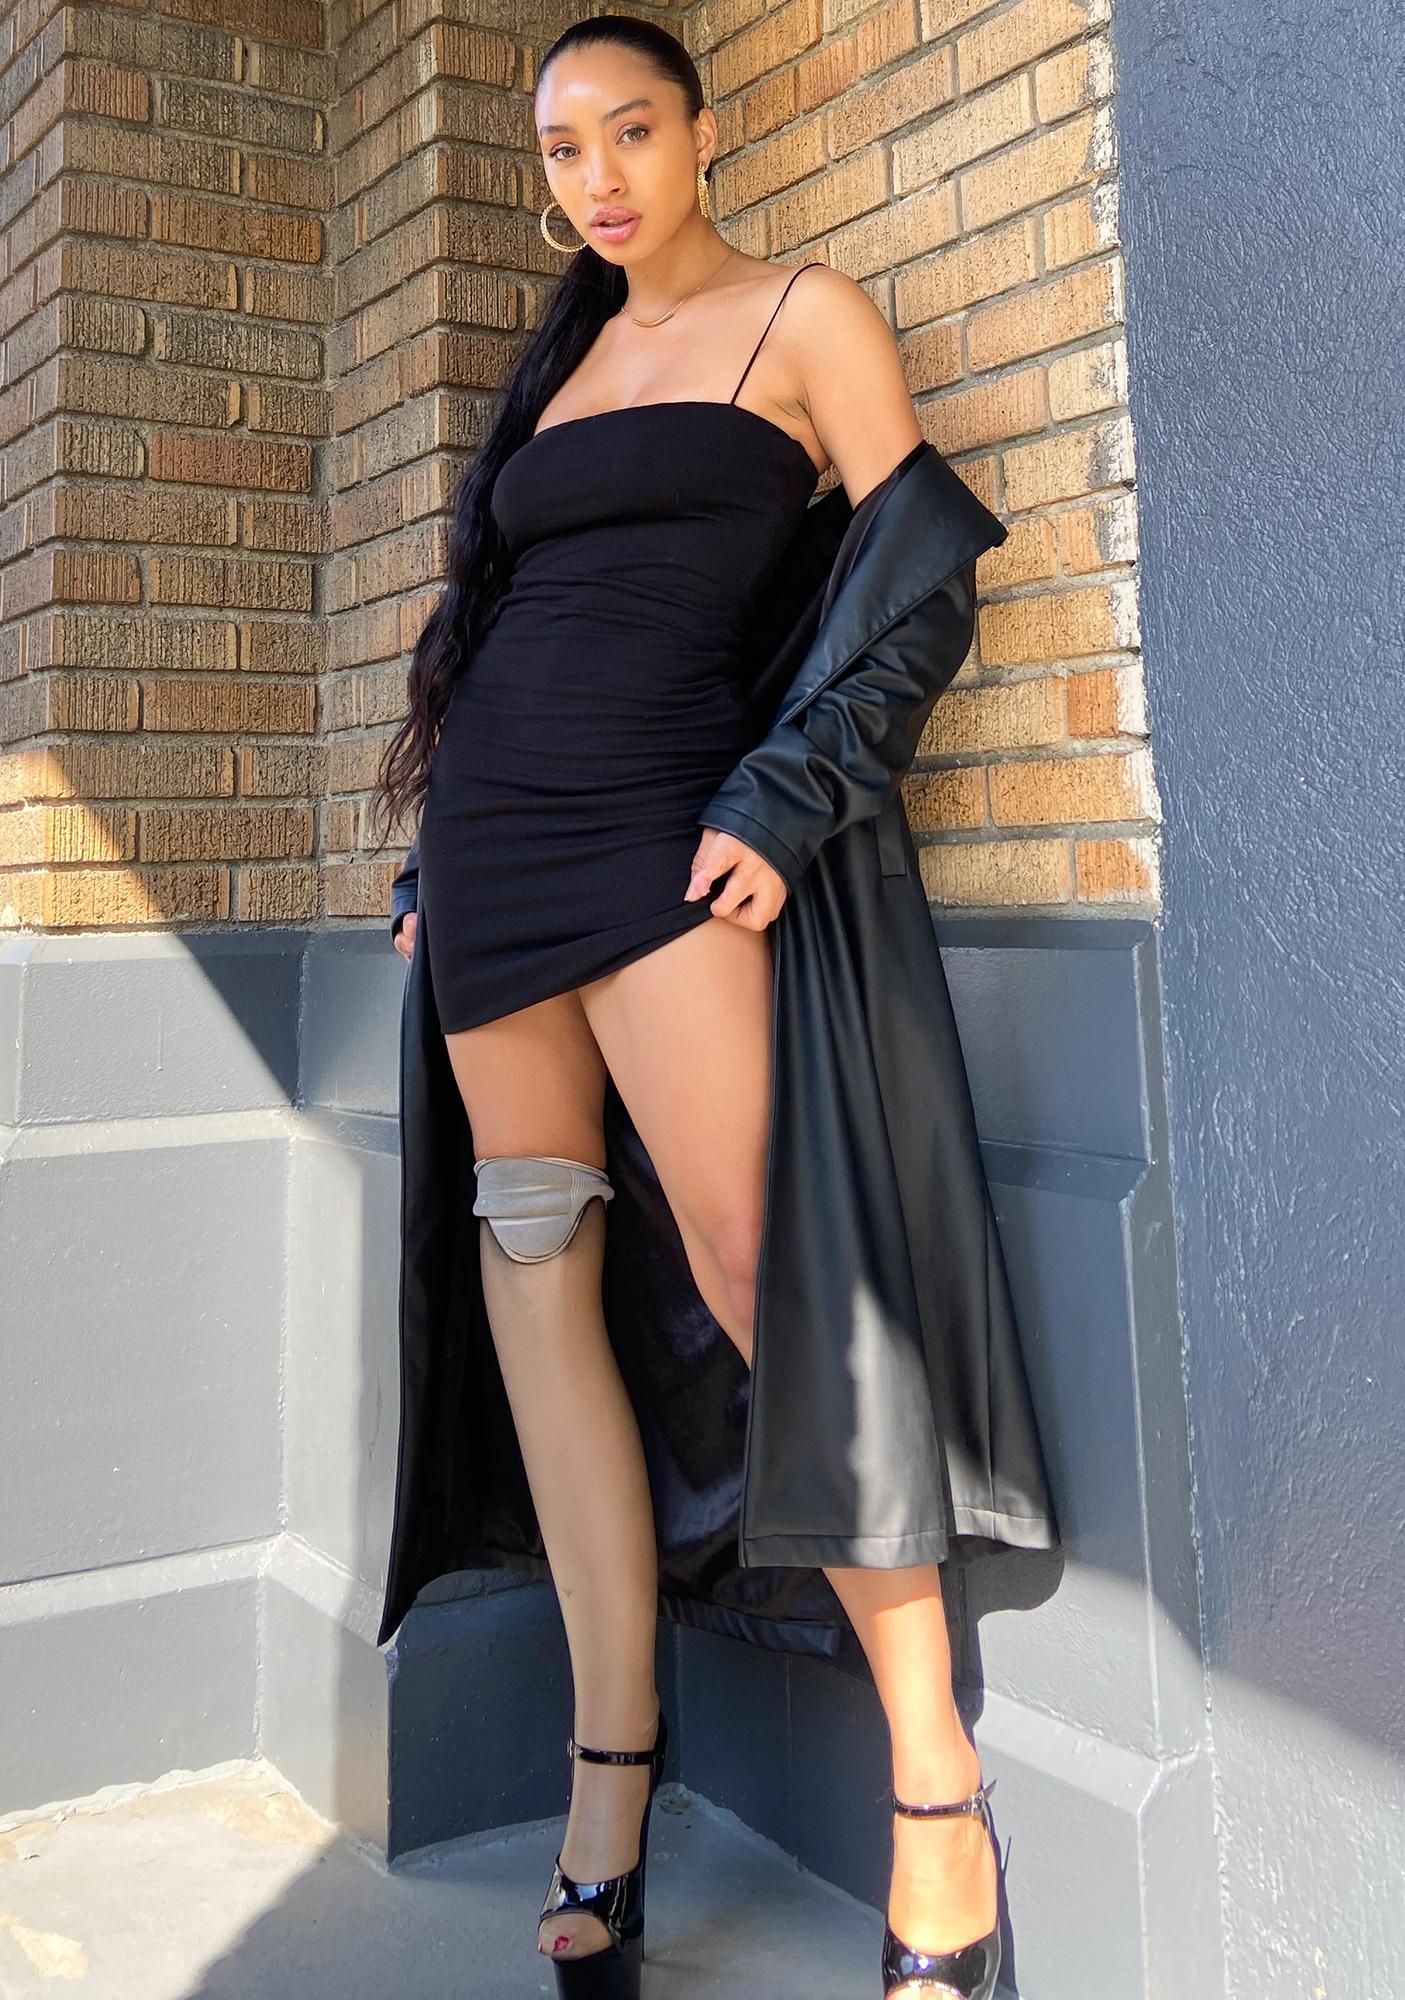 Dishonest Intentions Mini Dress